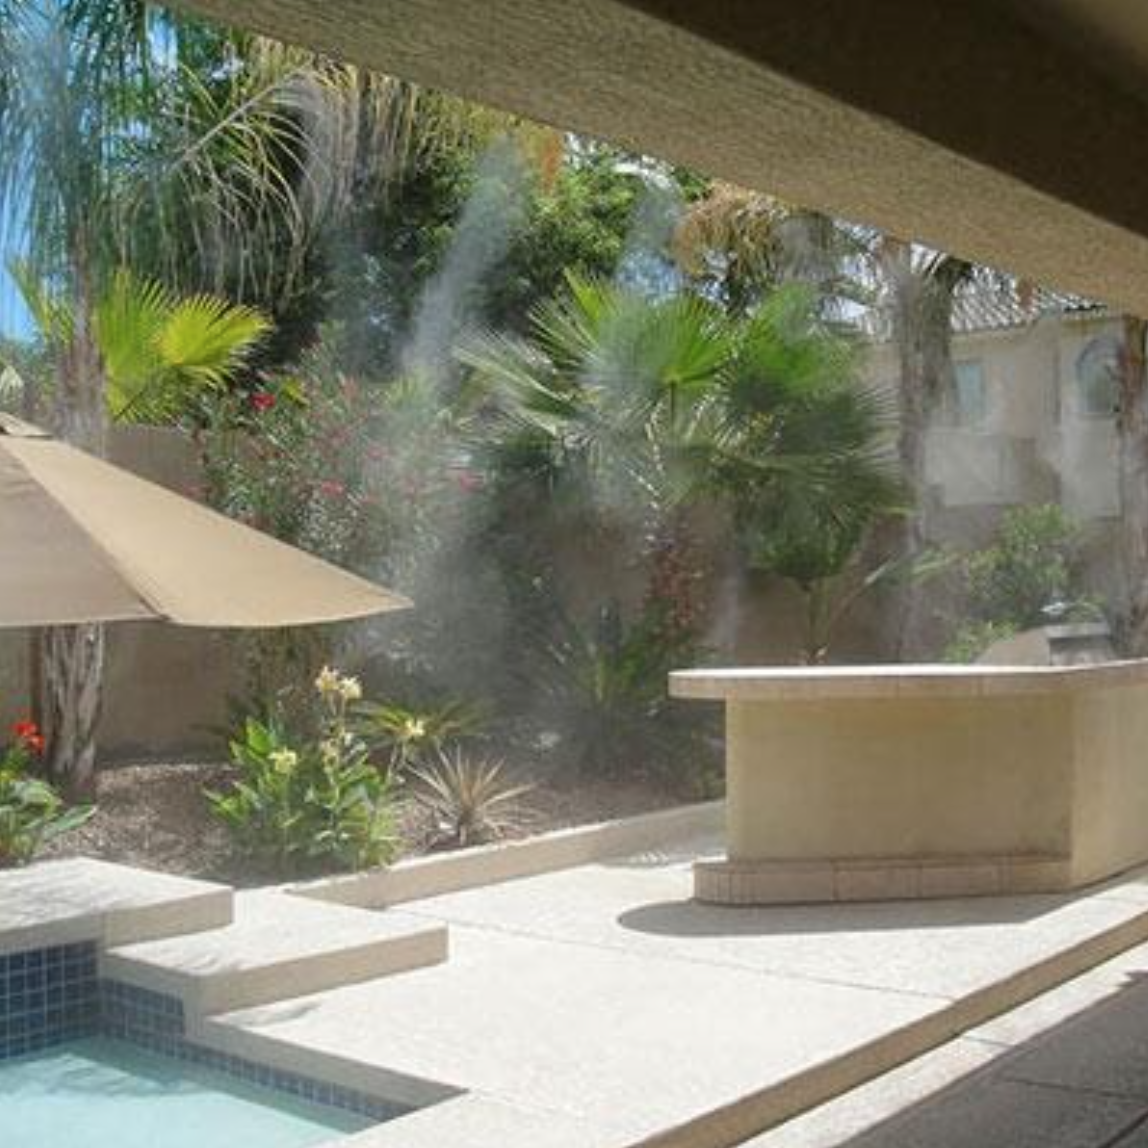 Custom residential misting system in backyard